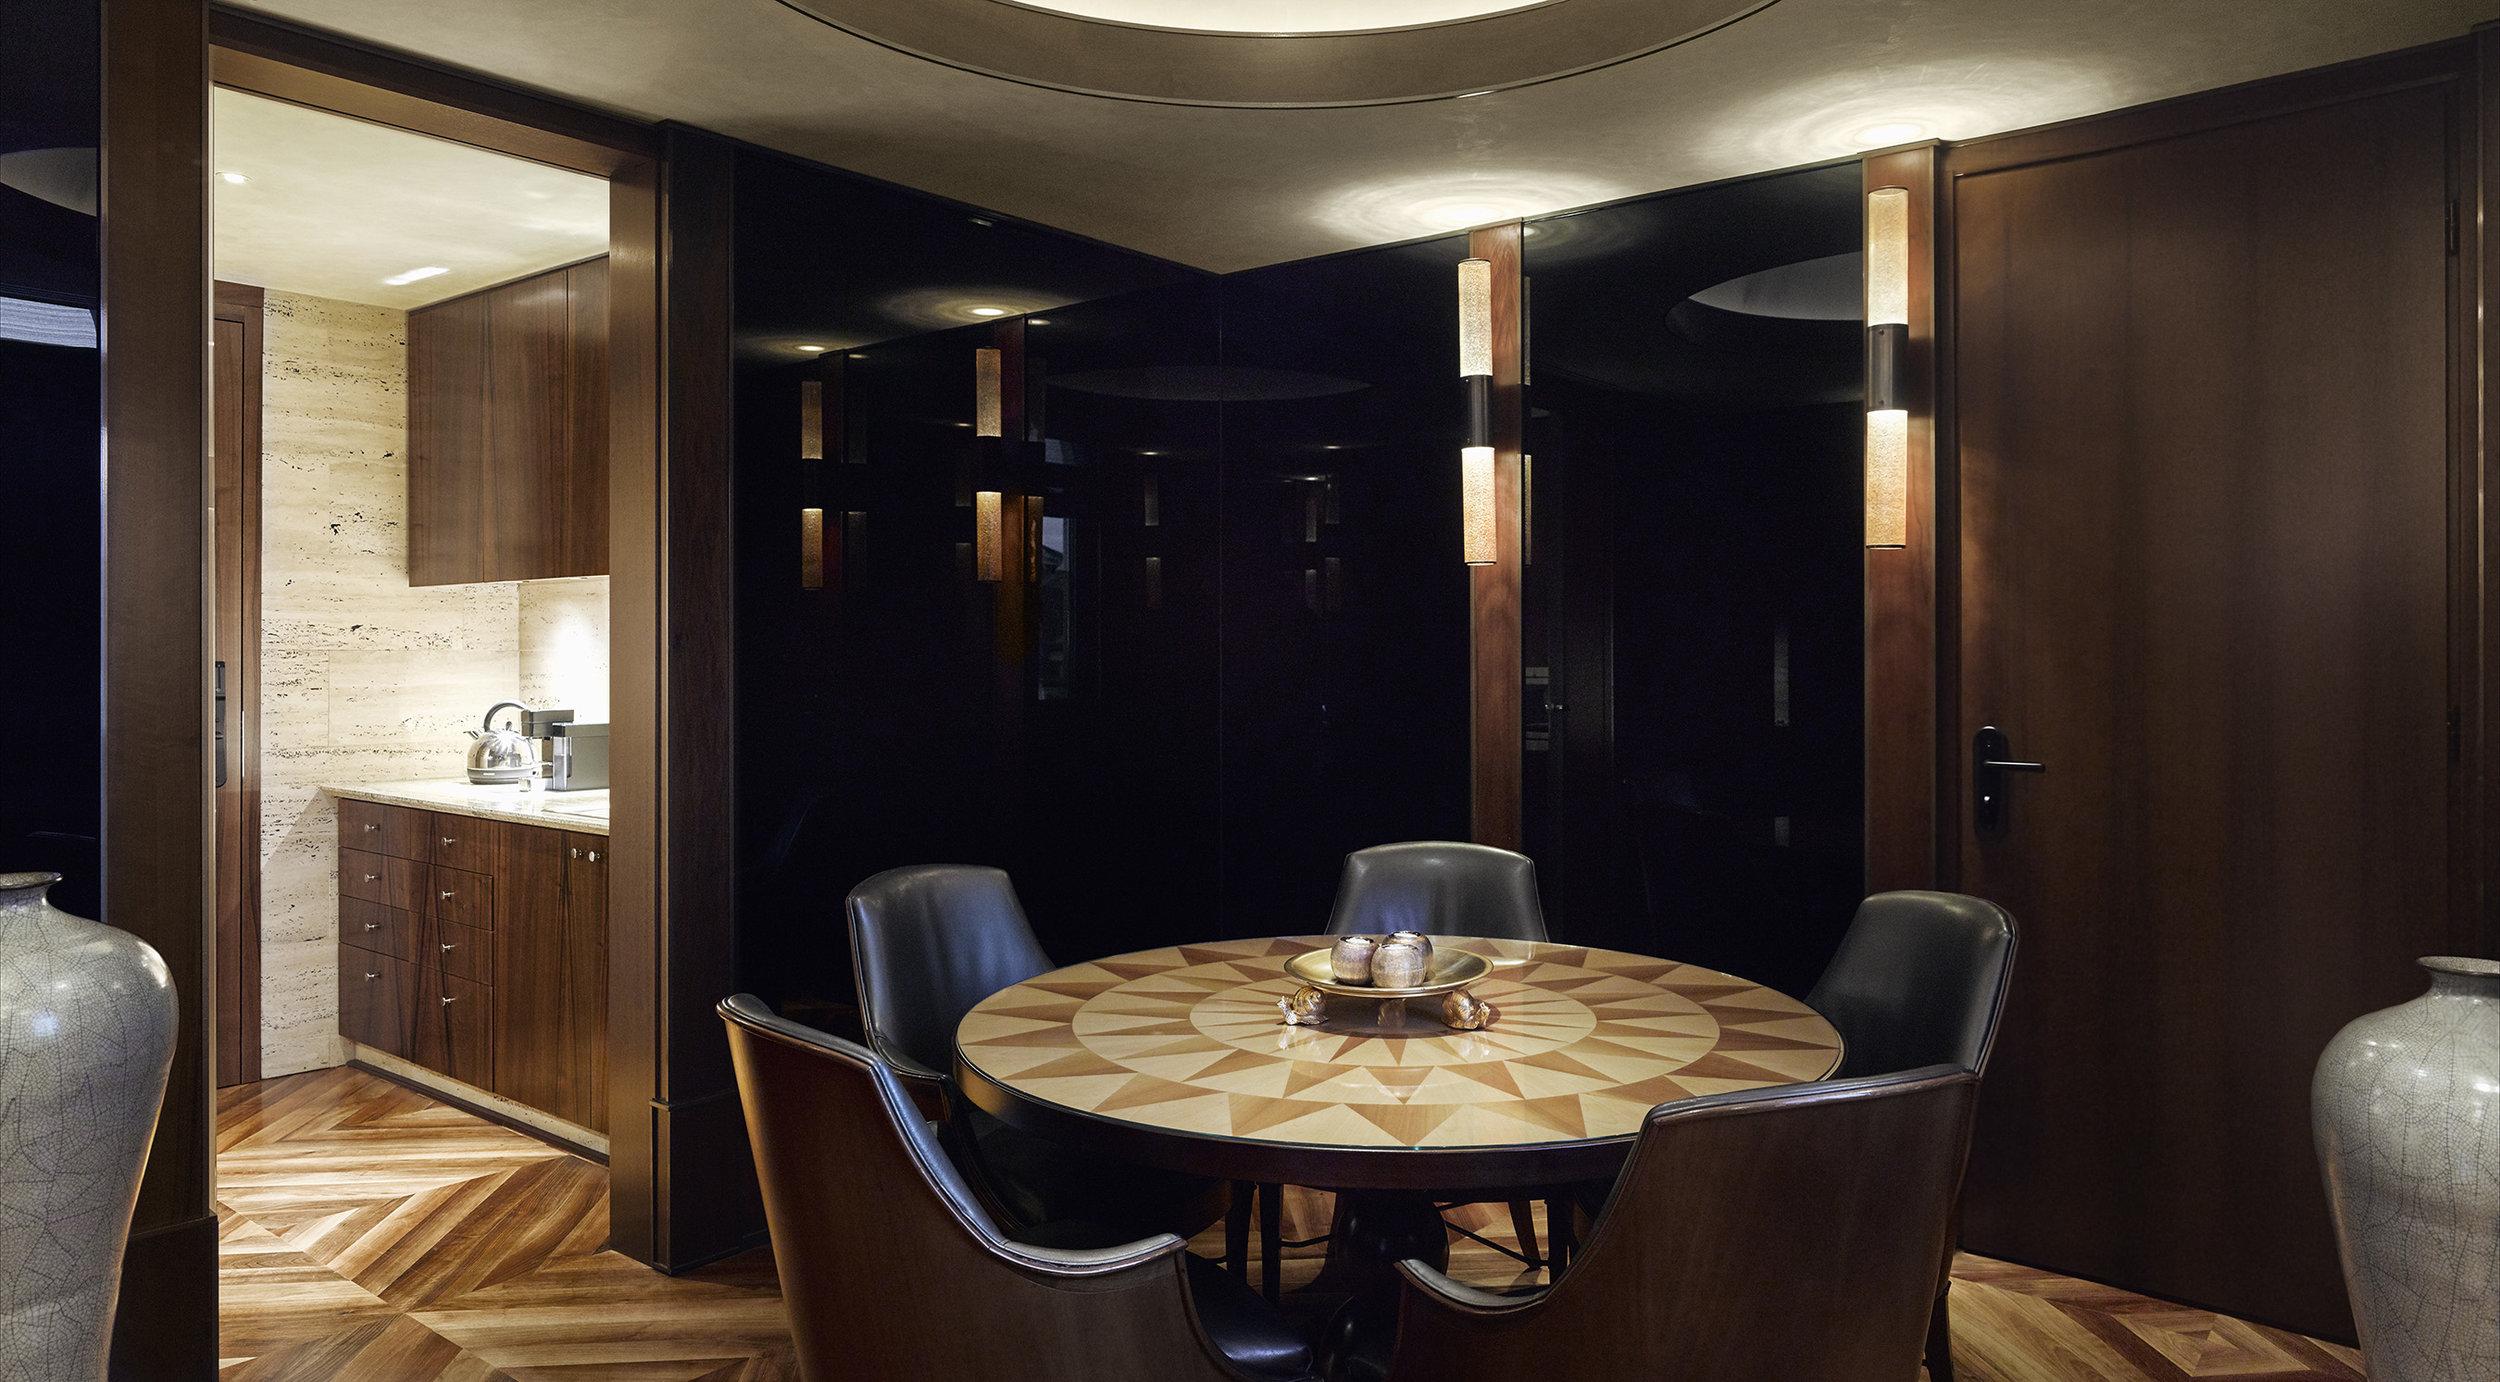 Park-Hyatt-Milano-DuomoSuite-DiningRoom.jpg